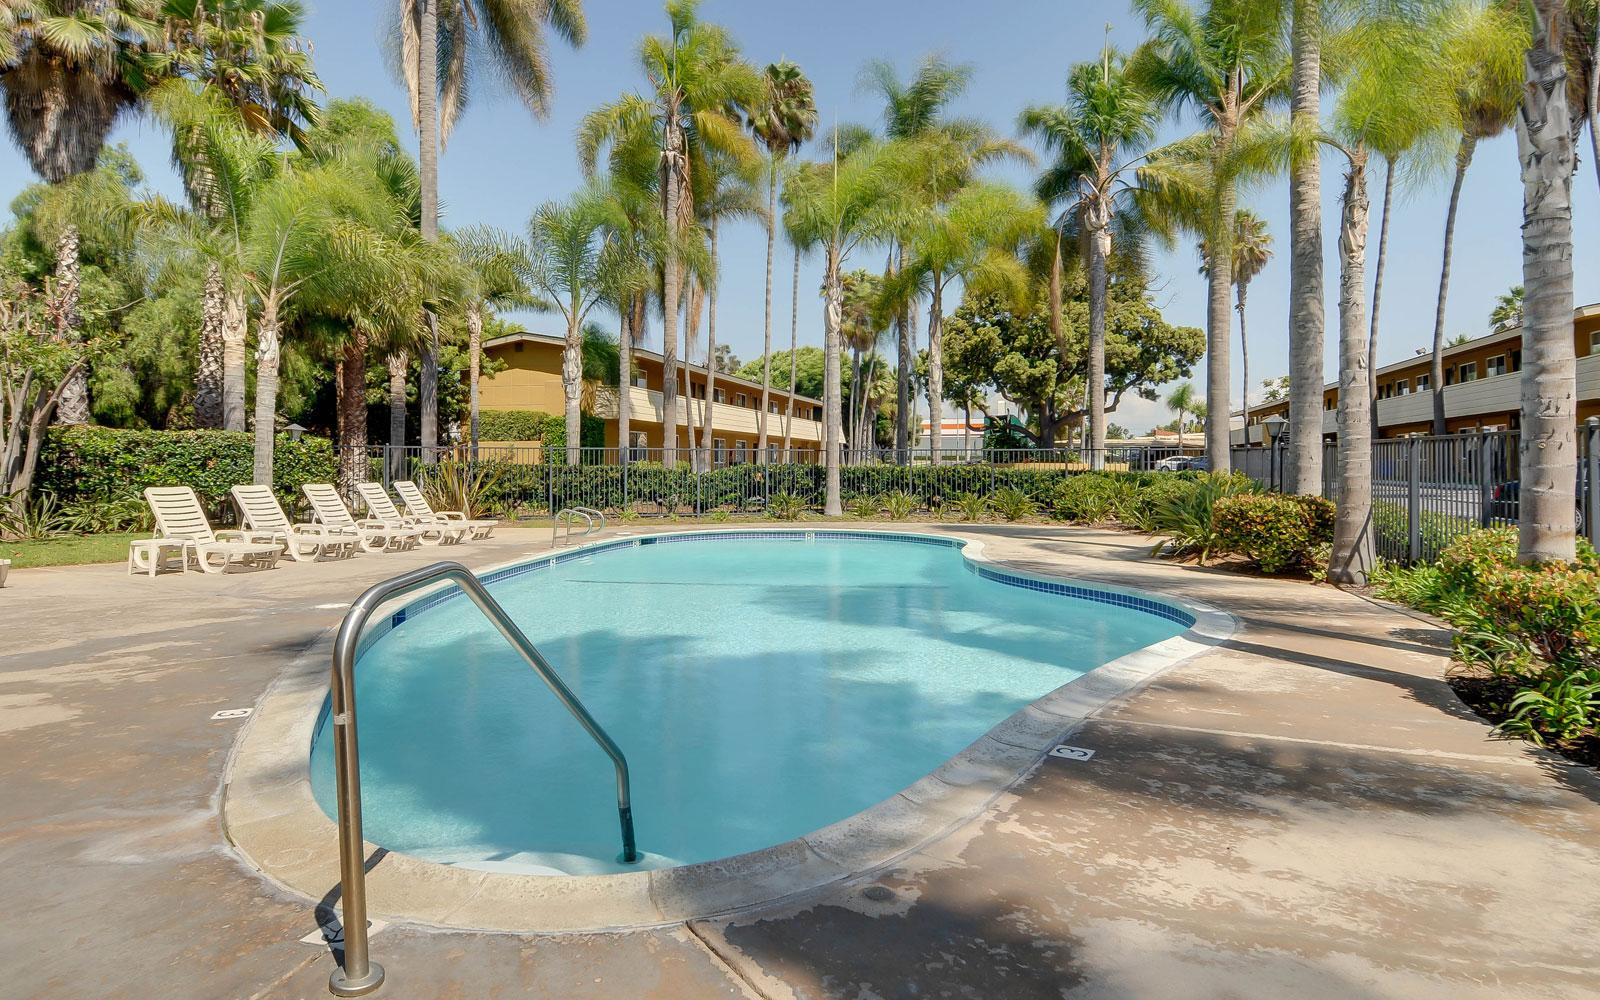 Chula Vista, CA Hotel - Vagabond Inn Chula Vista